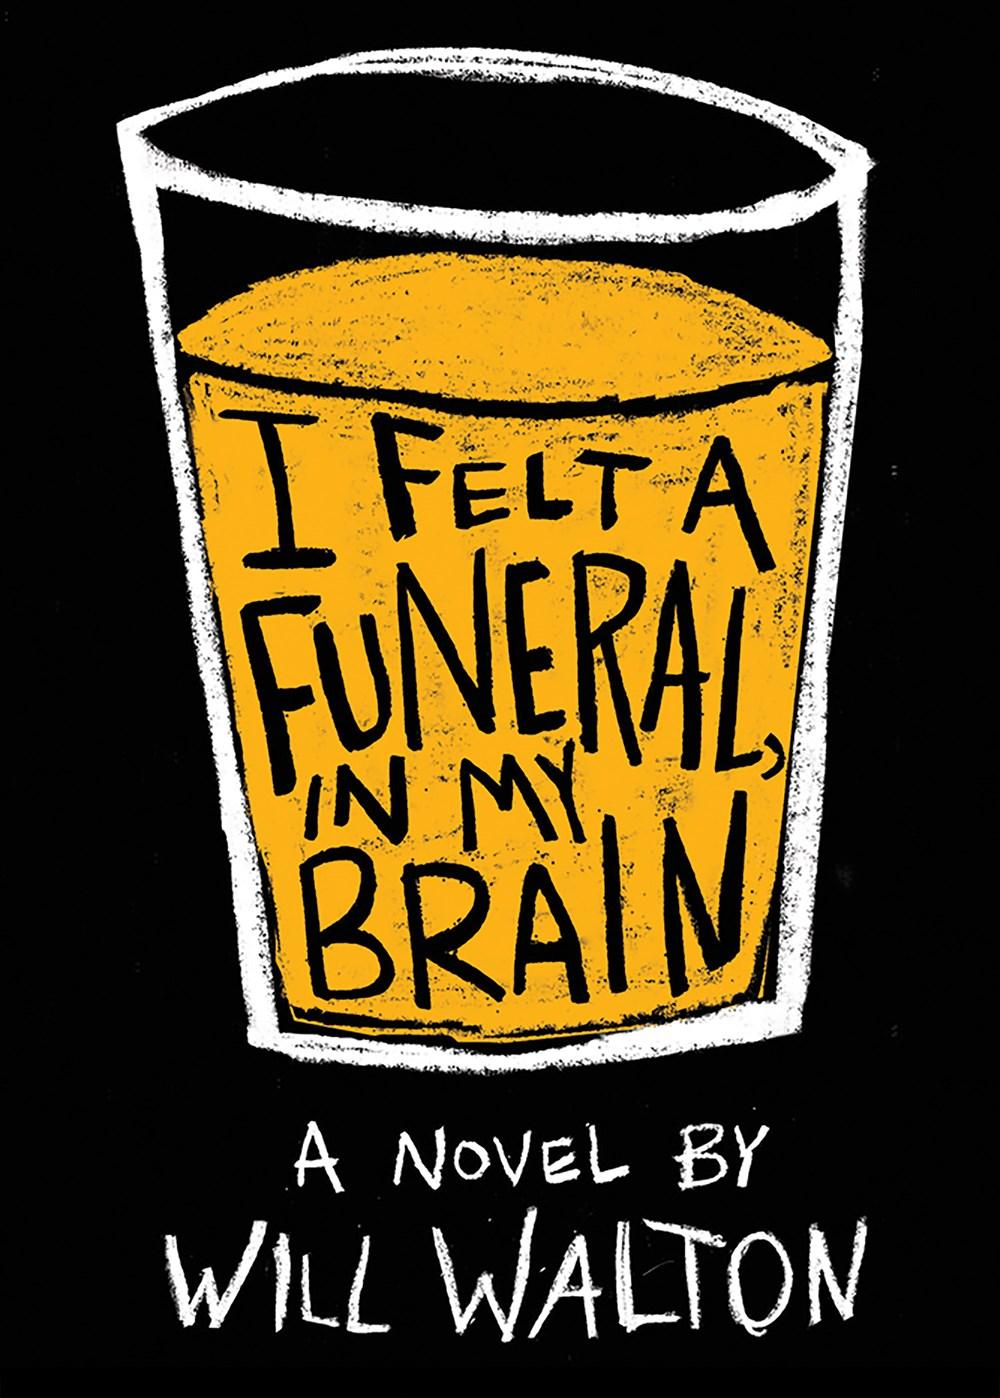 I Felt a Funeral in My Brain